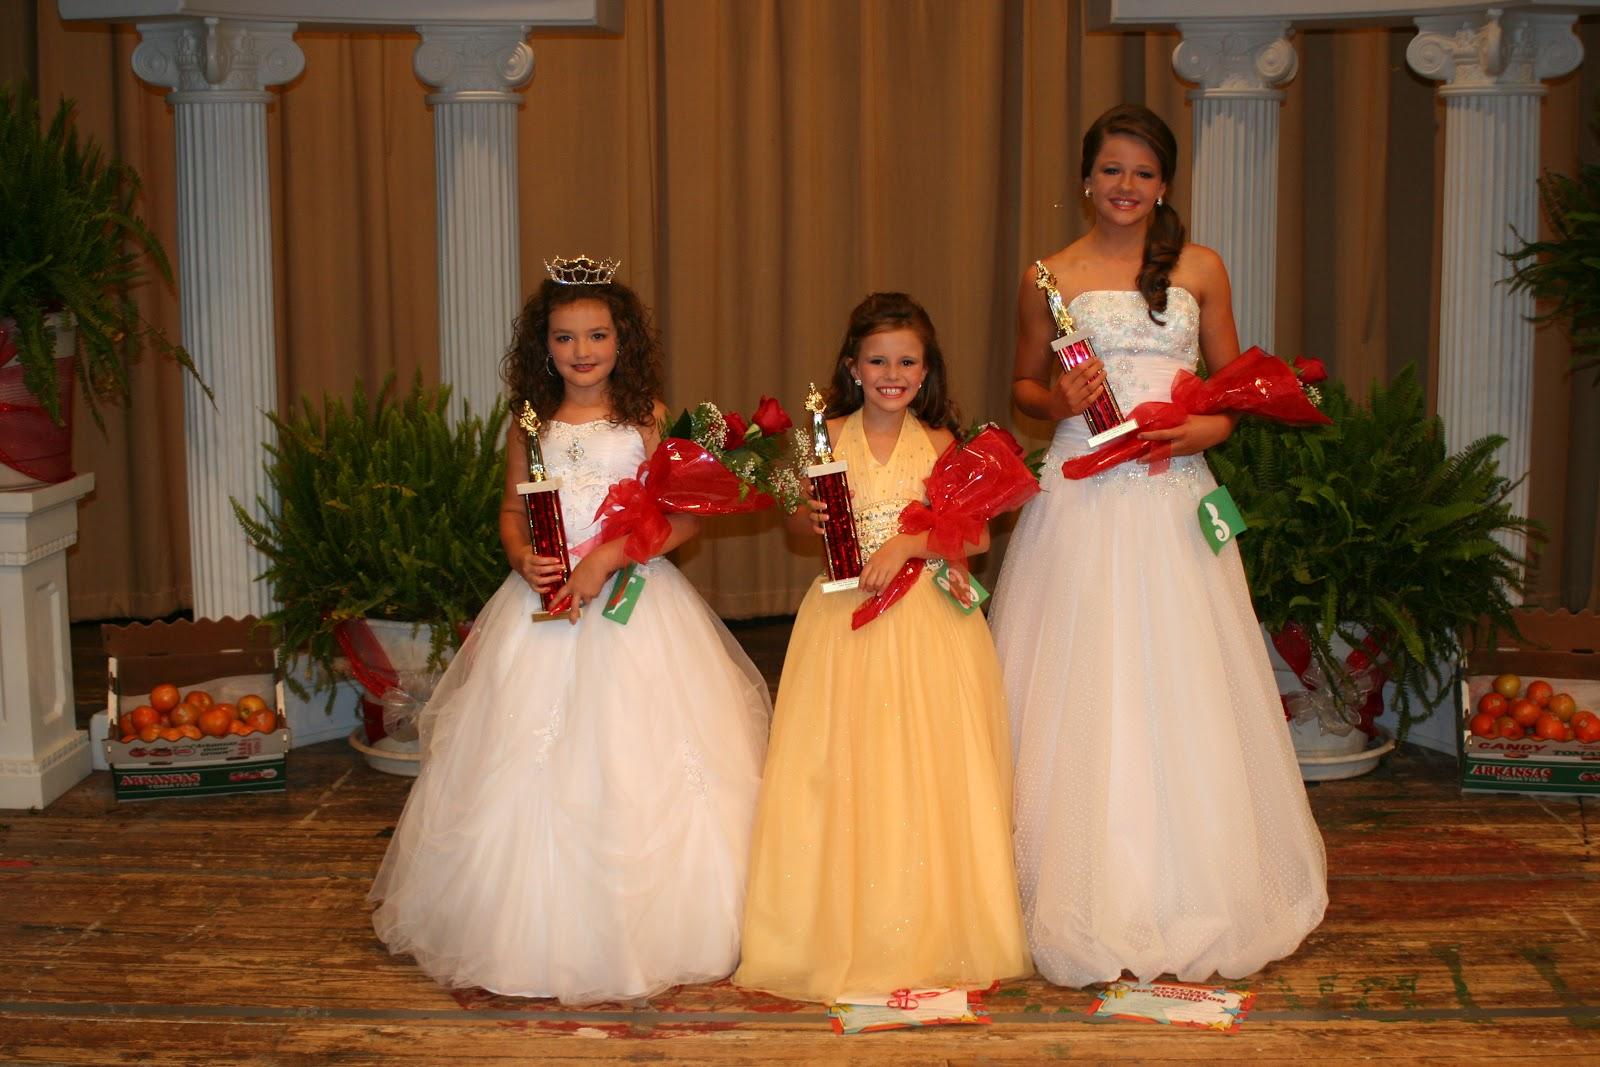 Saline River Chronicle News: Hermitage Girls Sweep Pageants